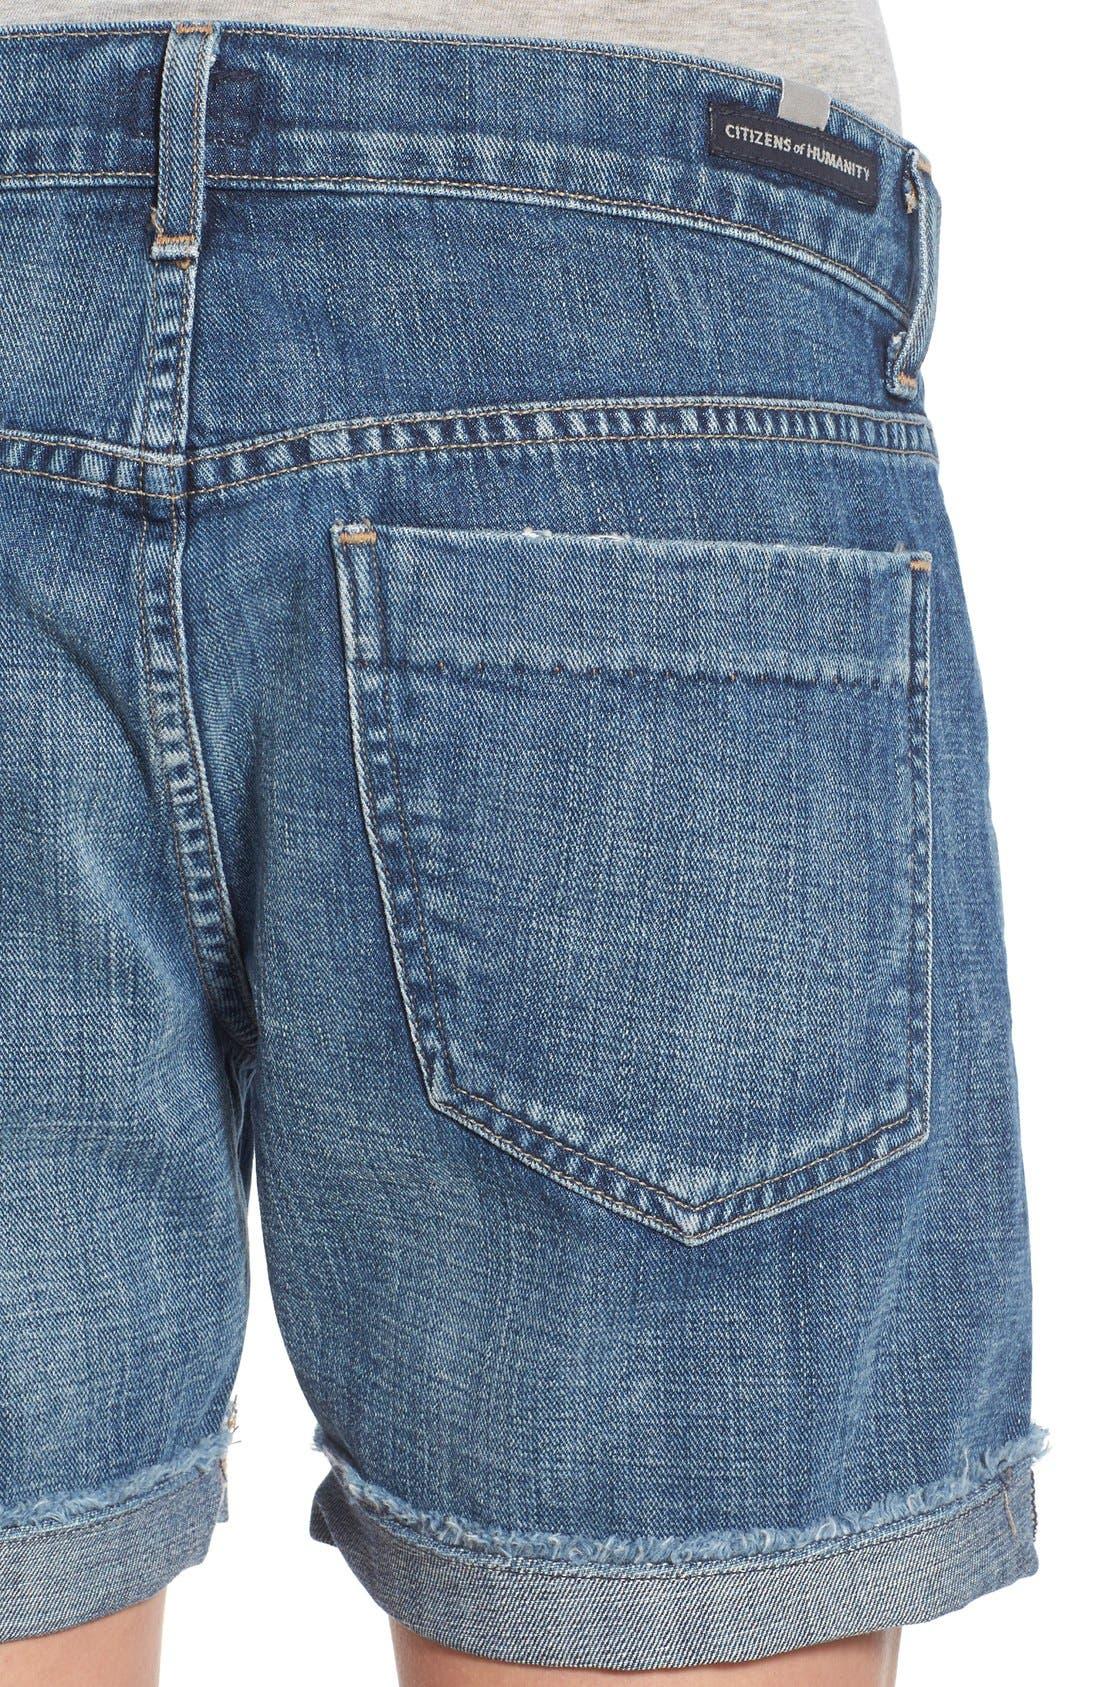 'Skyler' Cutoff Denim Shorts,                             Alternate thumbnail 4, color,                             Halo